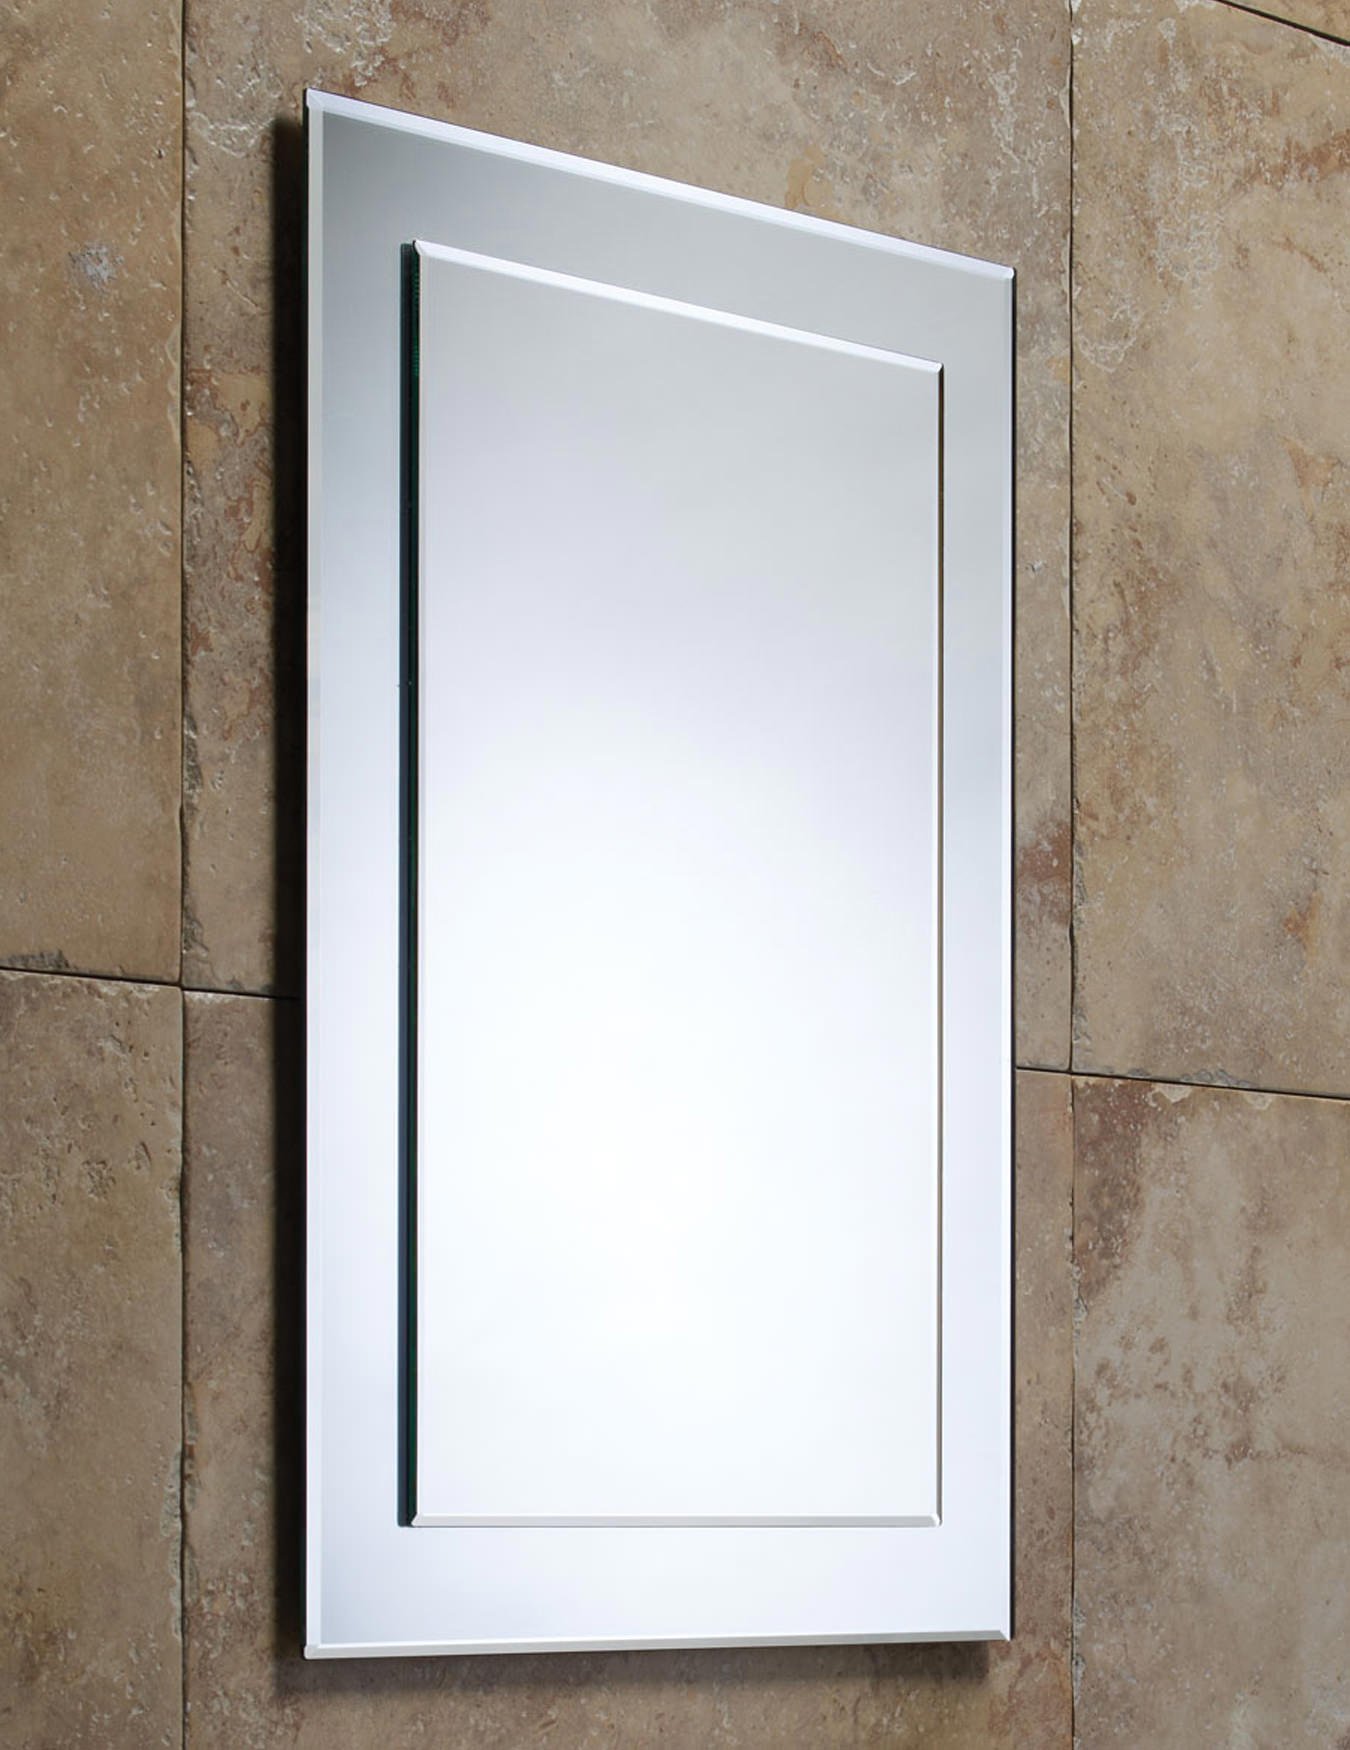 Roper Rhodes Elle Bevelled Mirror On Mirror Mps403